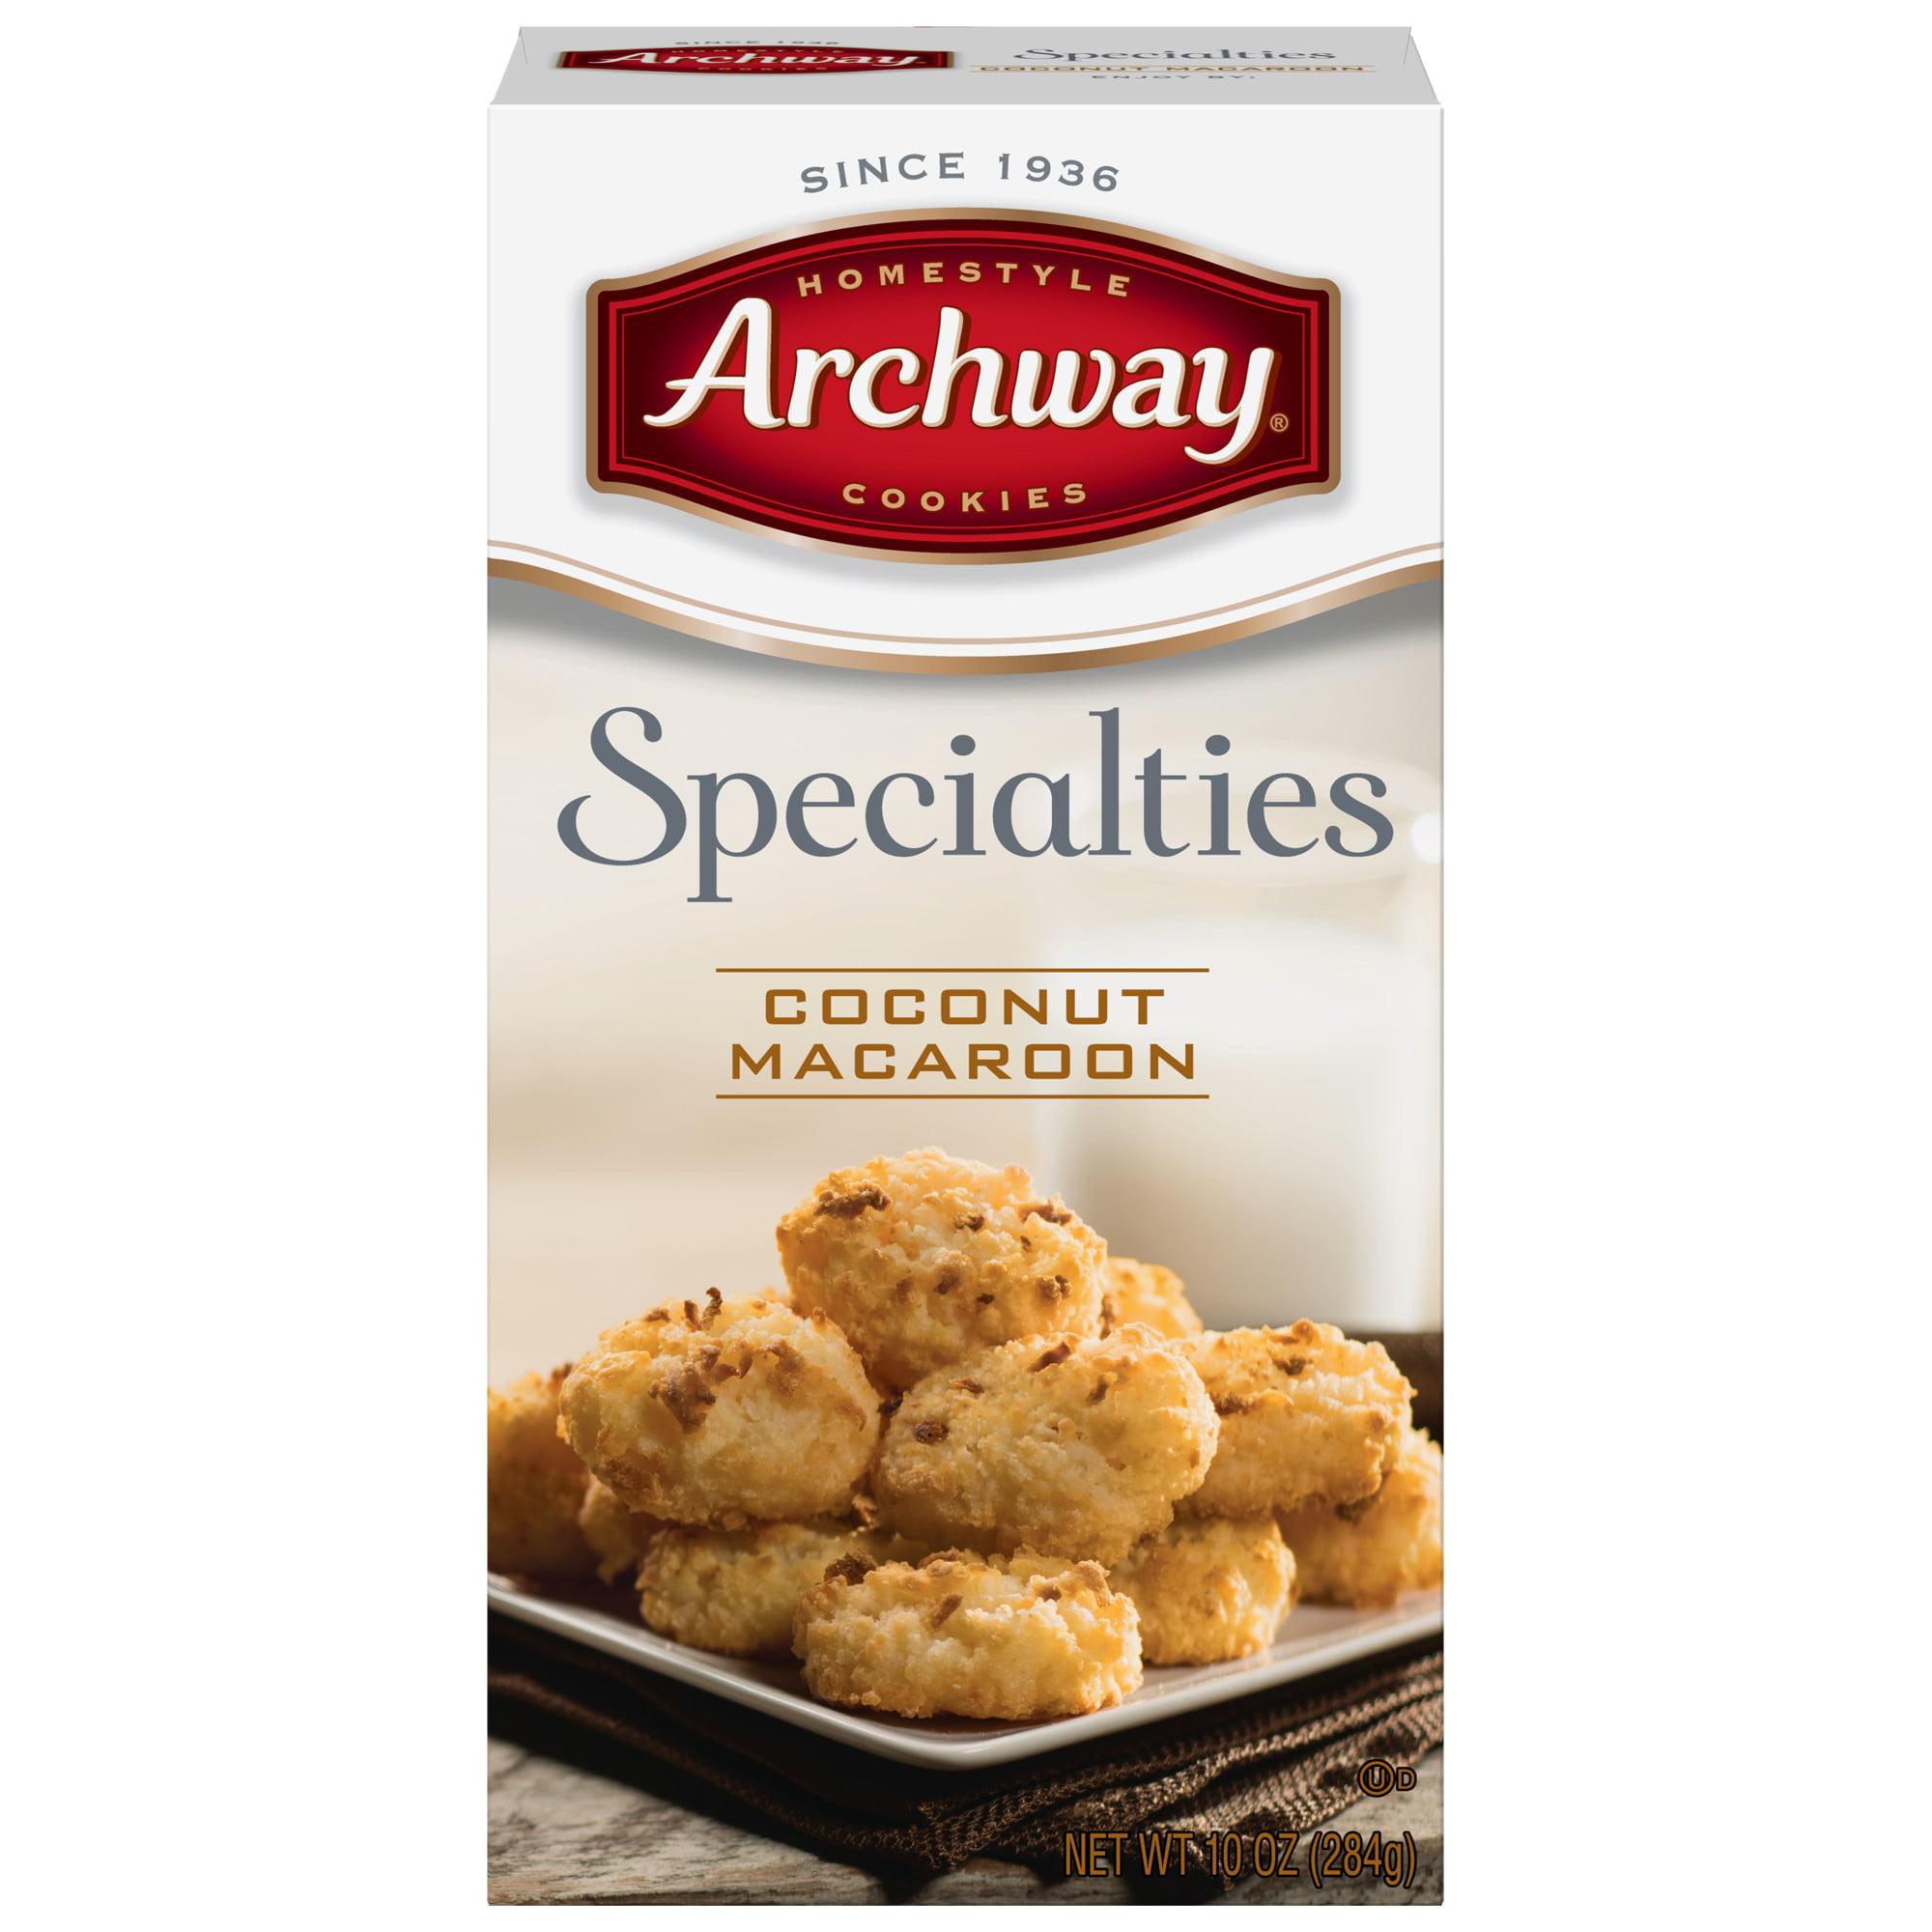 Archway Original Coconut Macaroon Cookies, 10 Oz